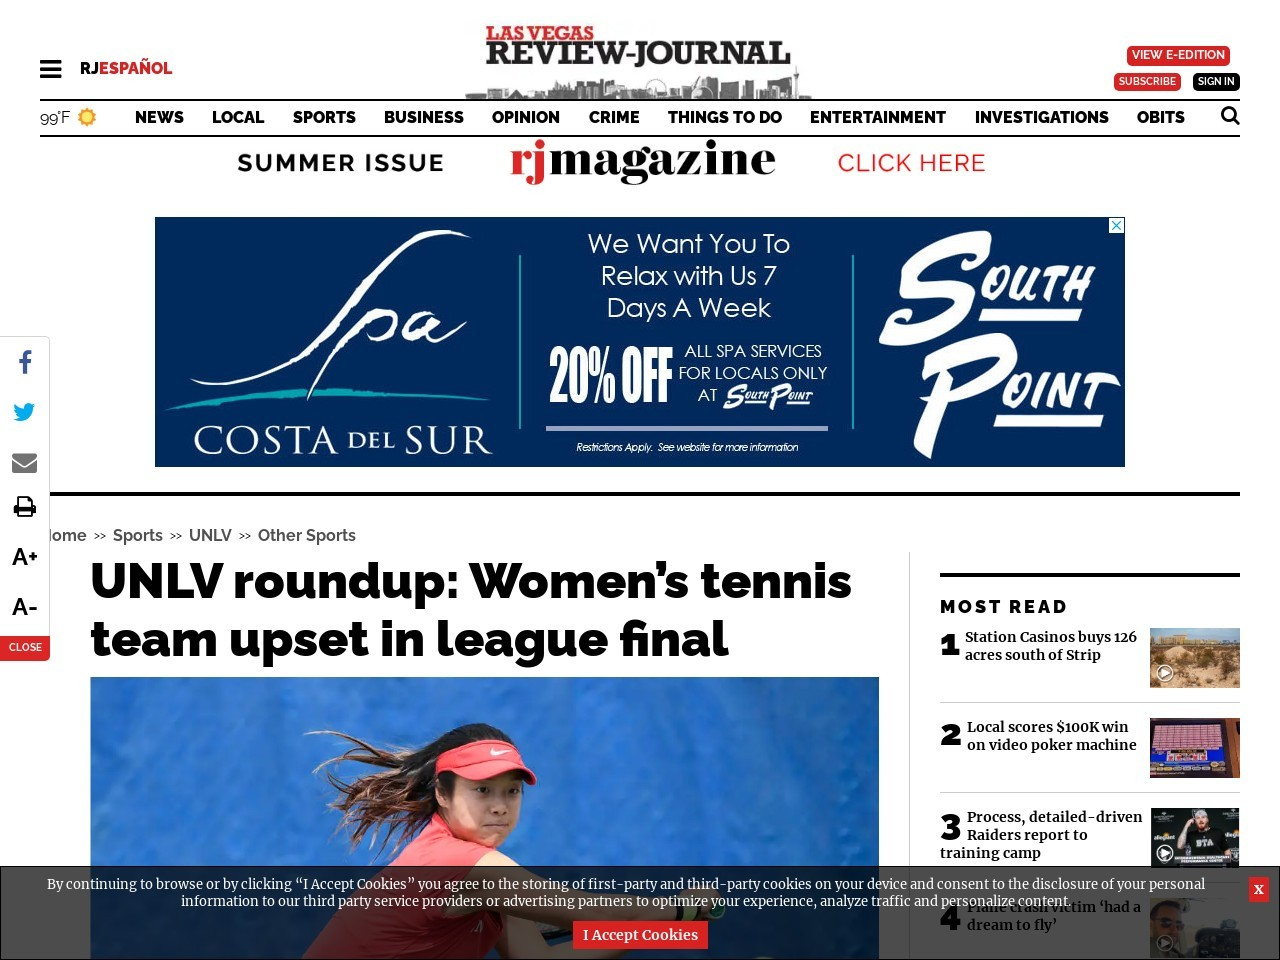 UNLV roundup: Women's tennis team upset in league final